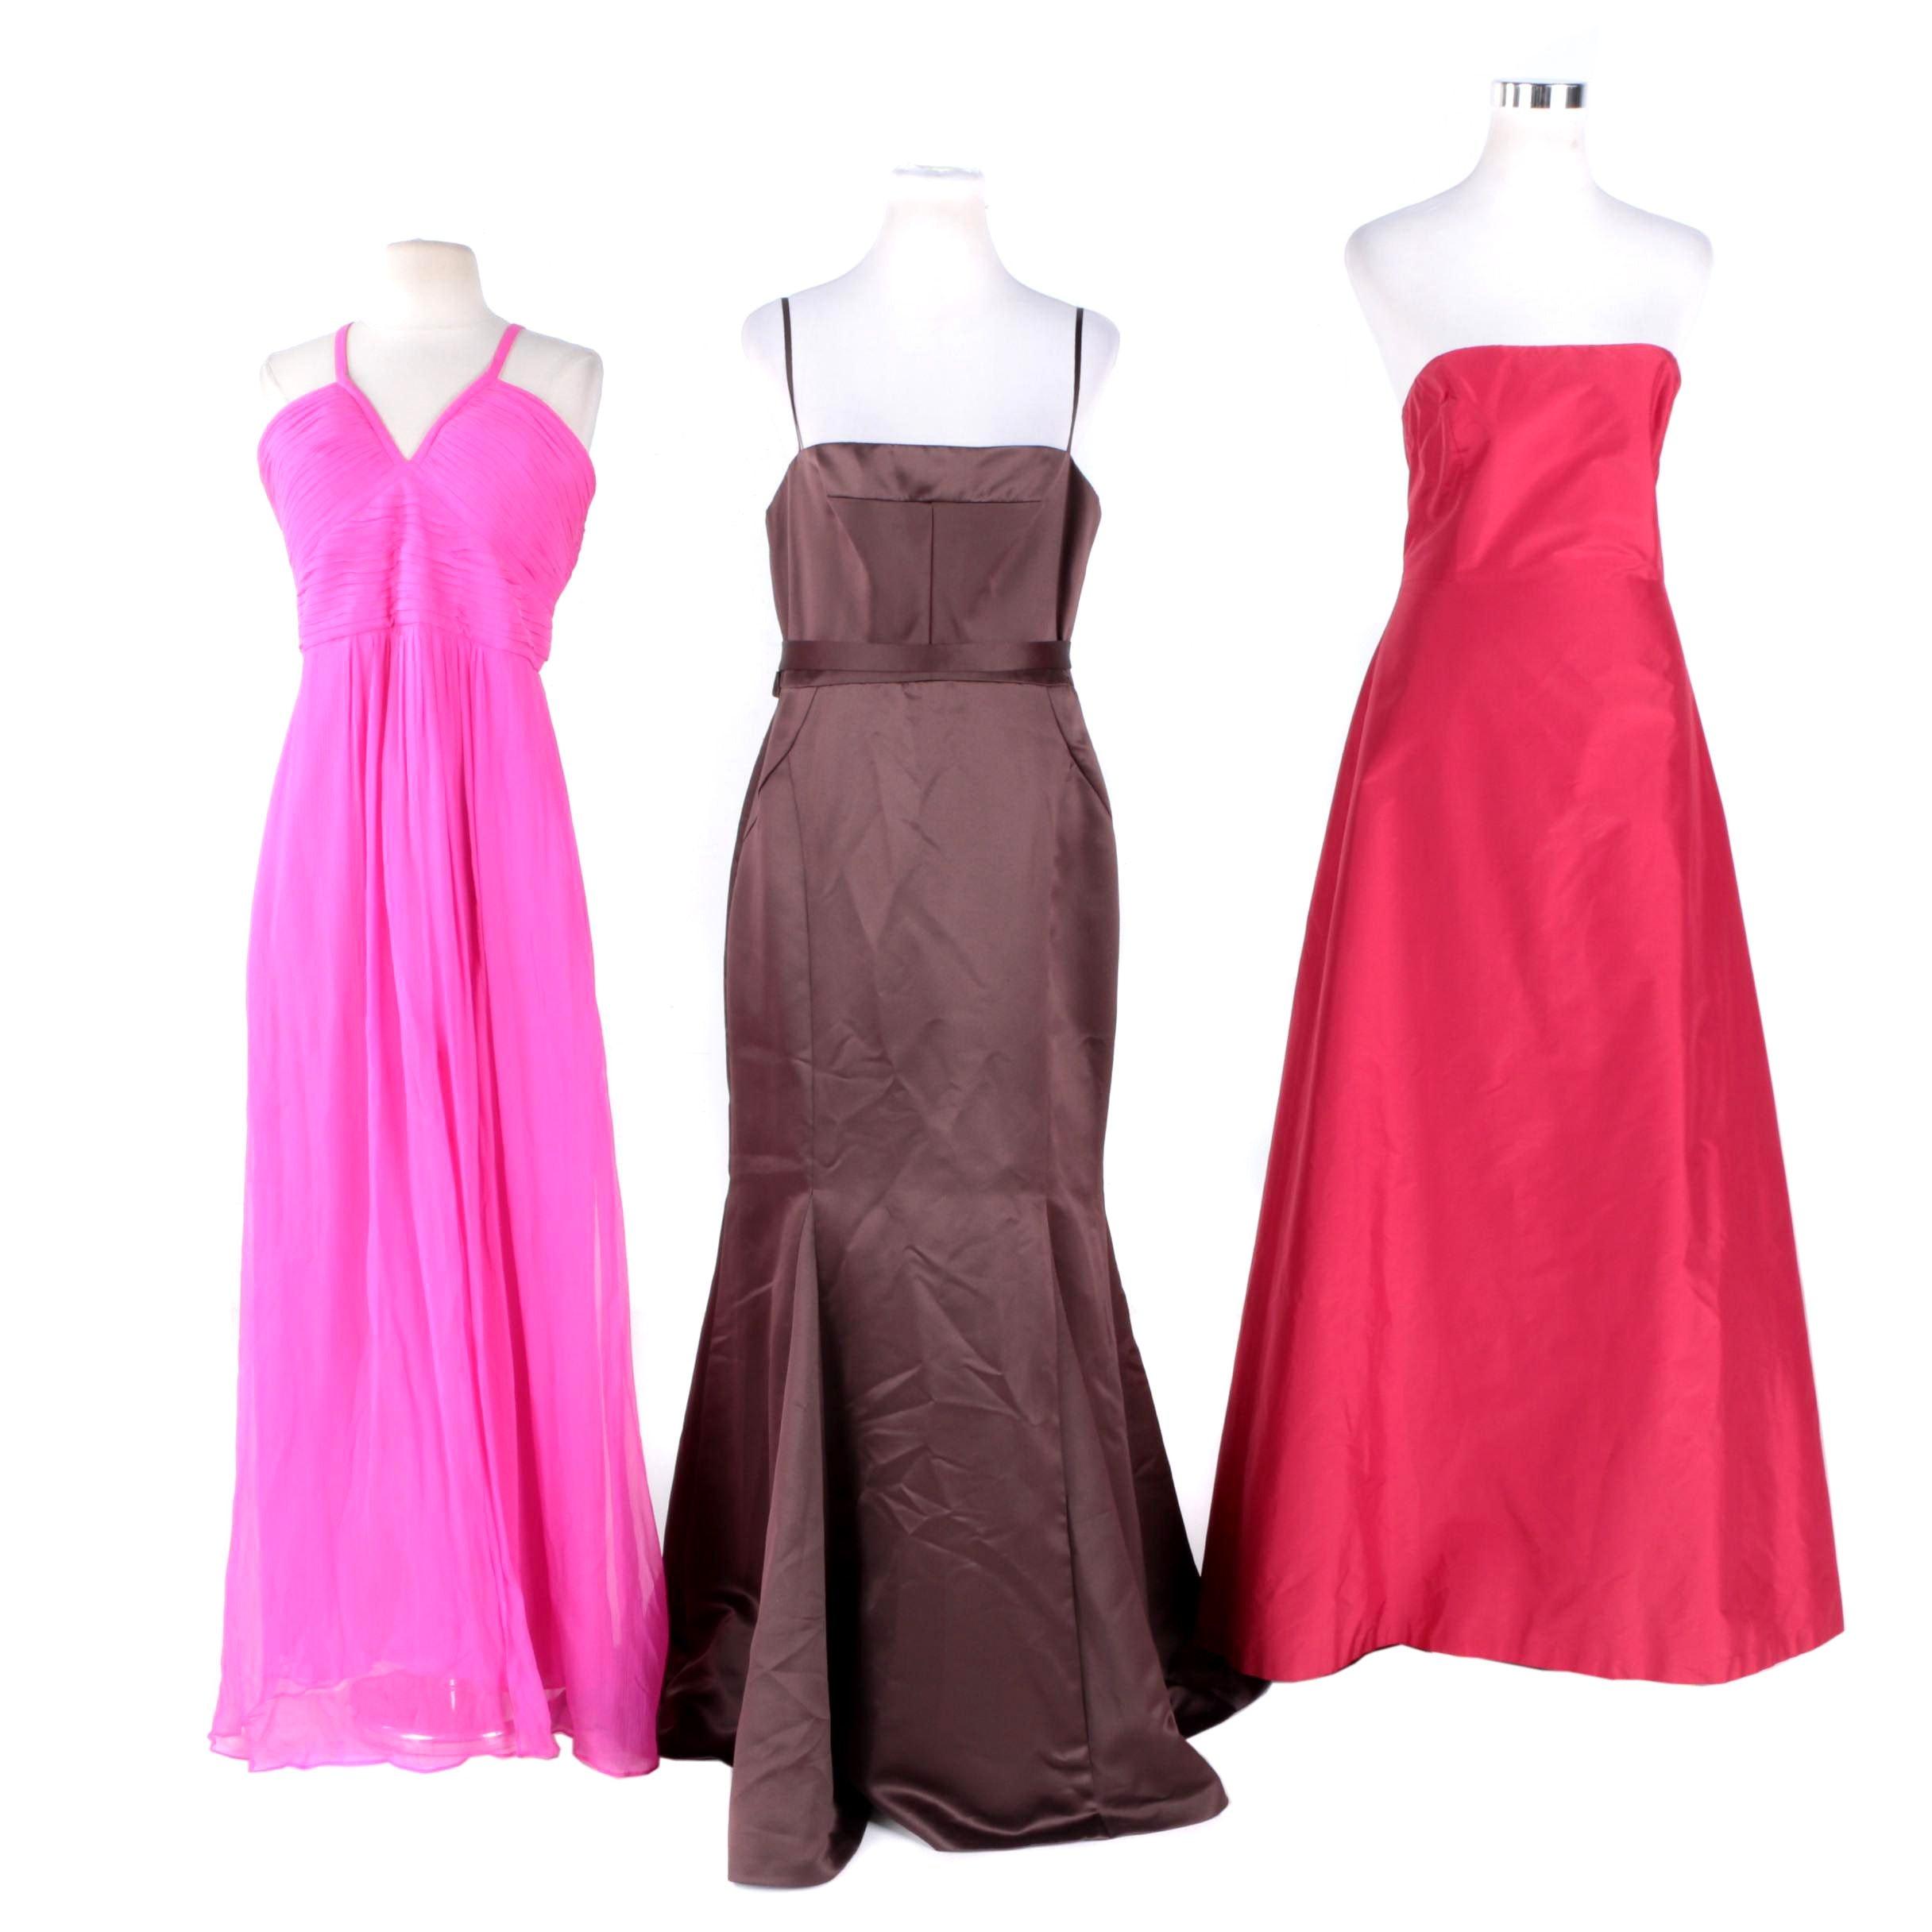 Women's Evening Gowns Including BCBGMAXAZRIA